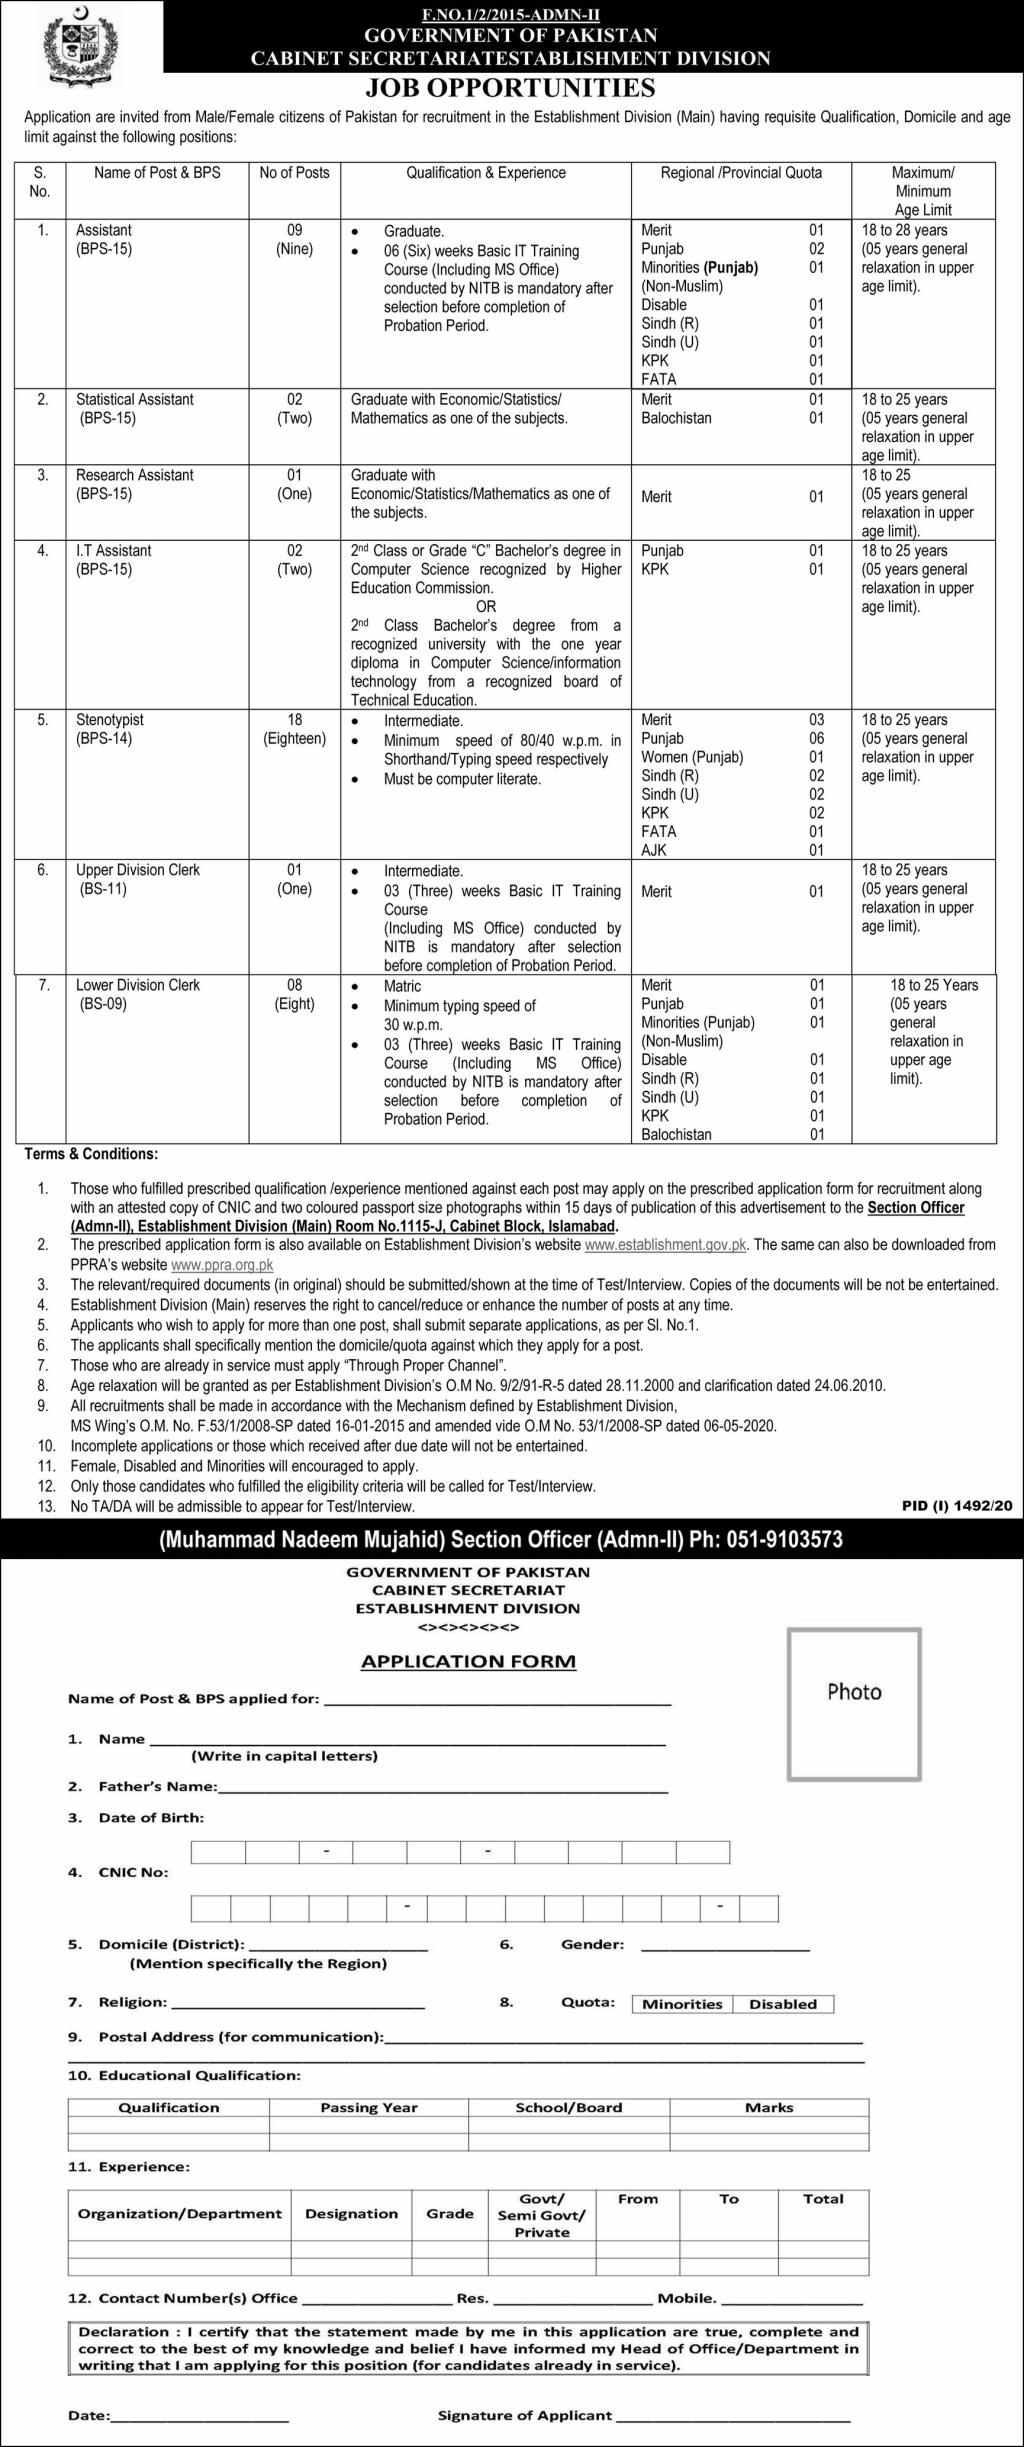 Cabinet Secretariat Establishment Division Jobs 2020 for Assistant